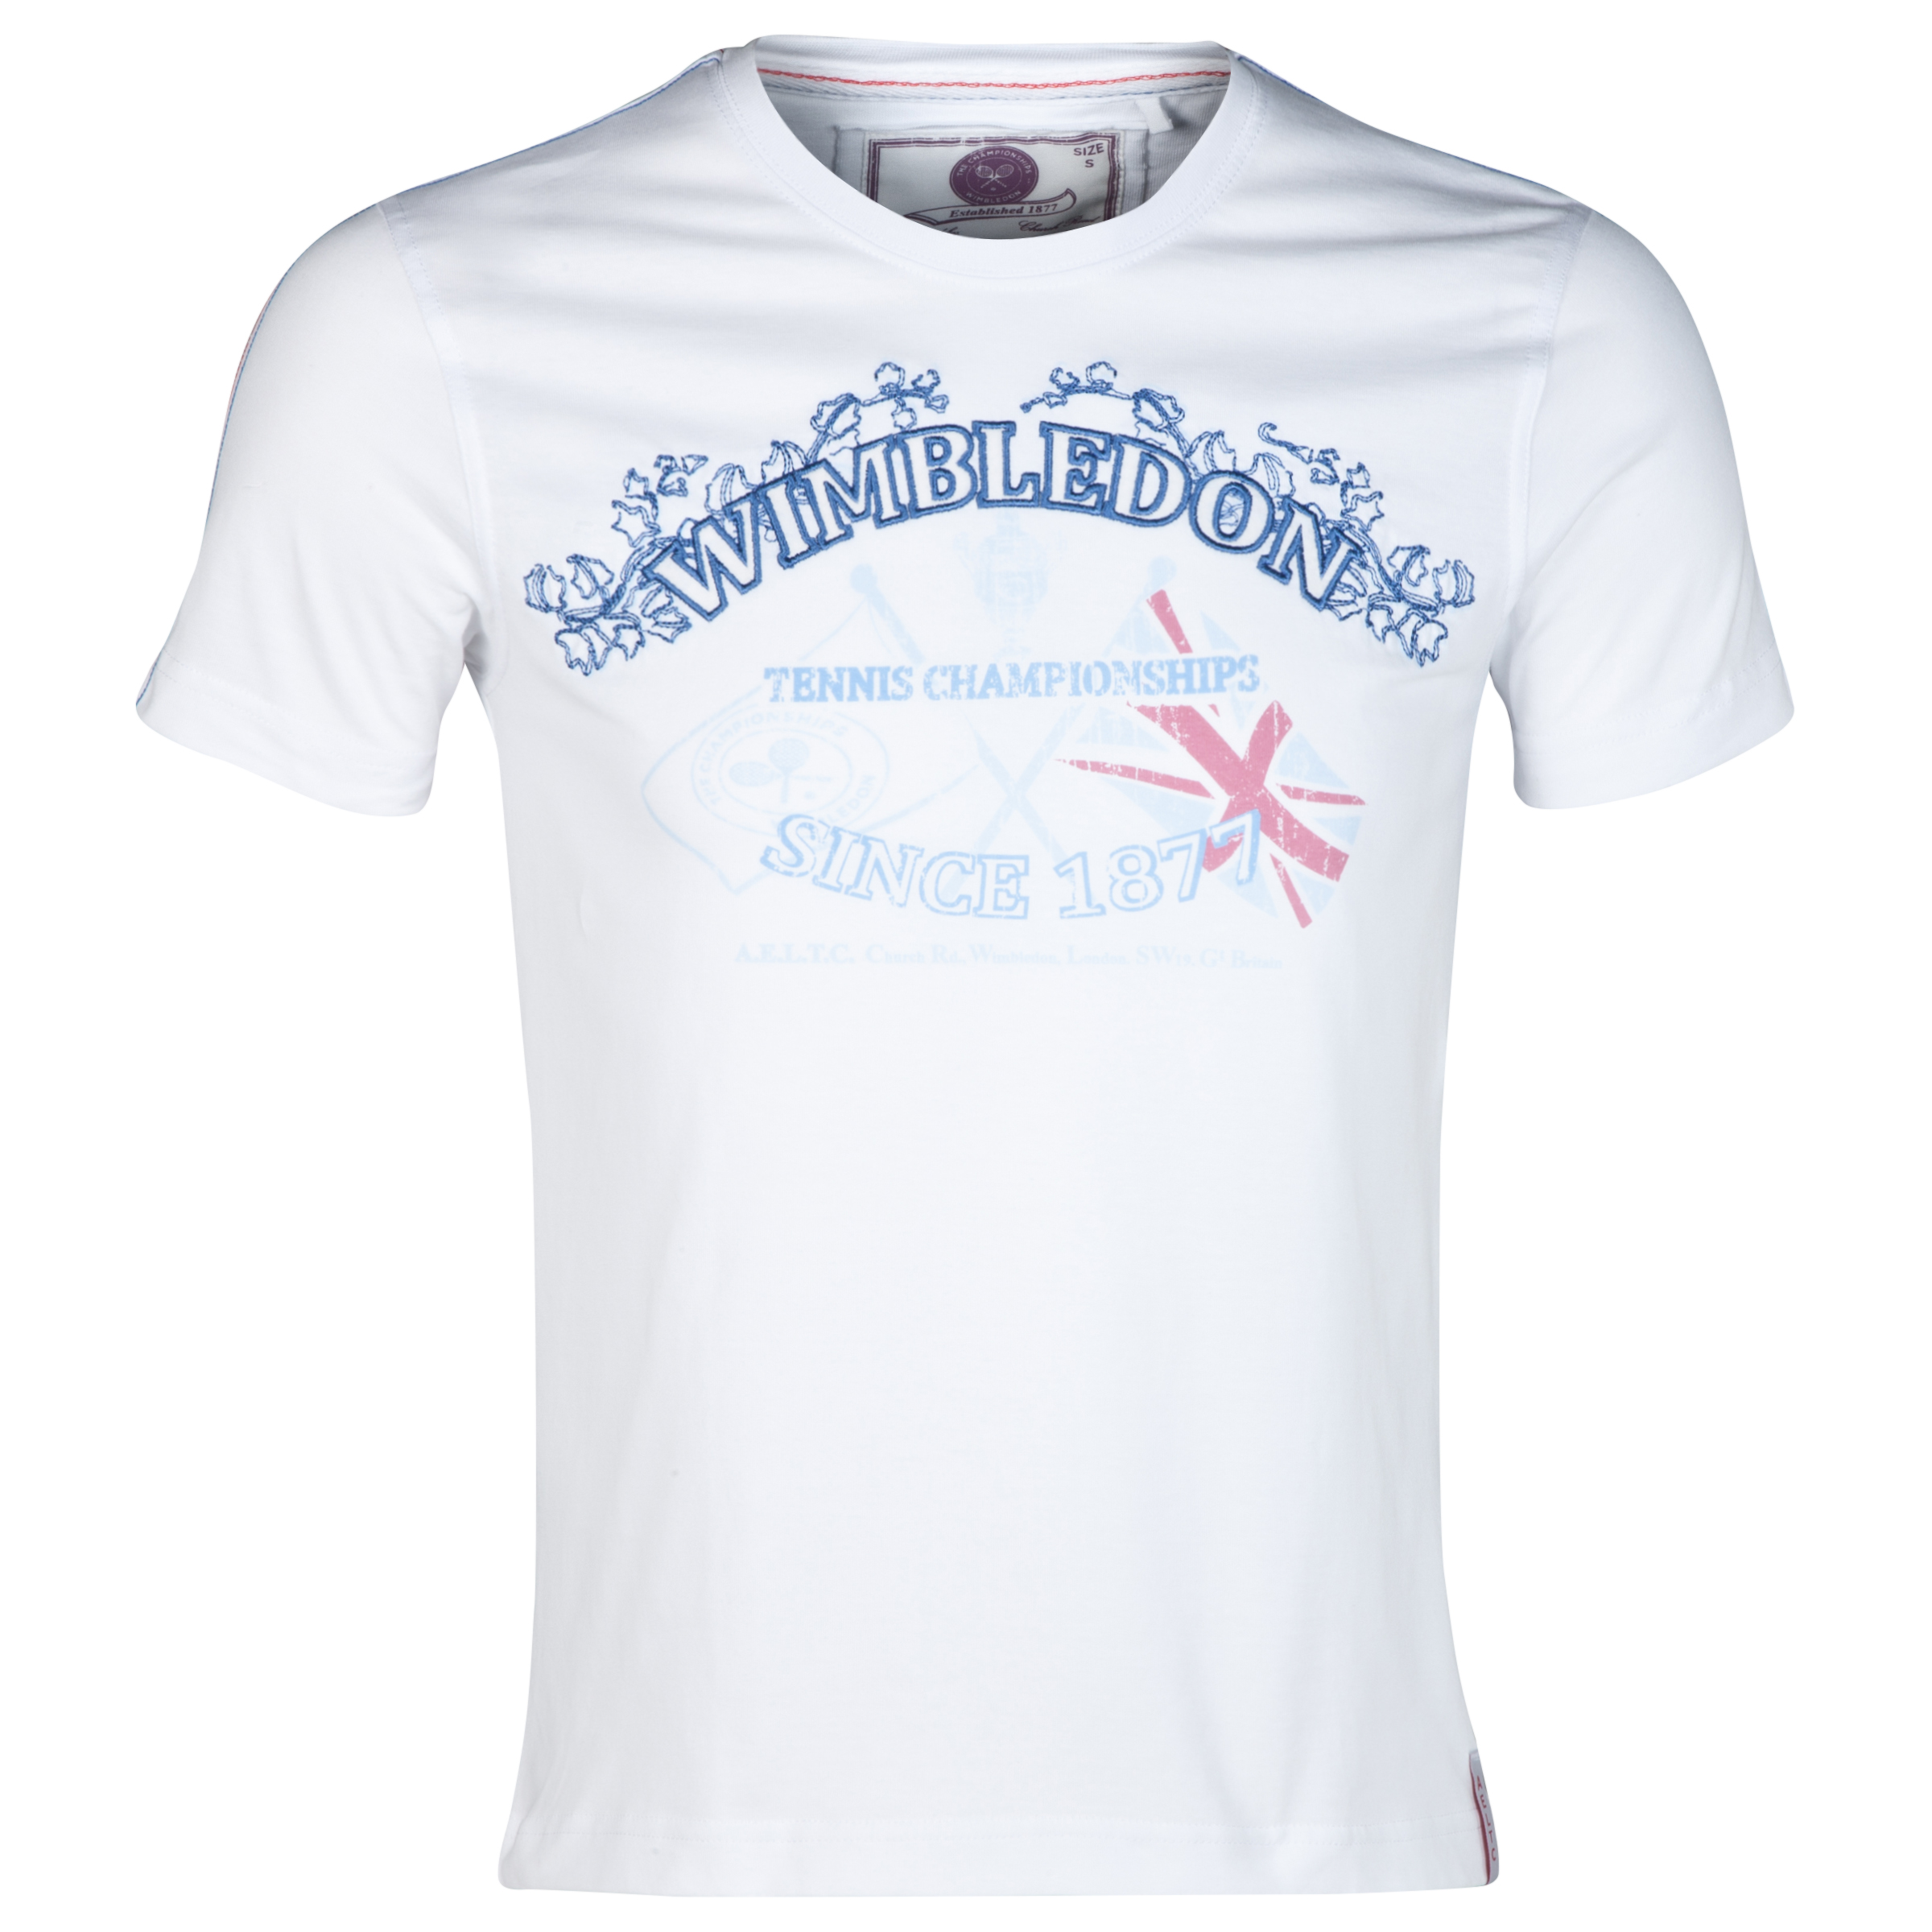 Wimbledon Applique T-Shirt White